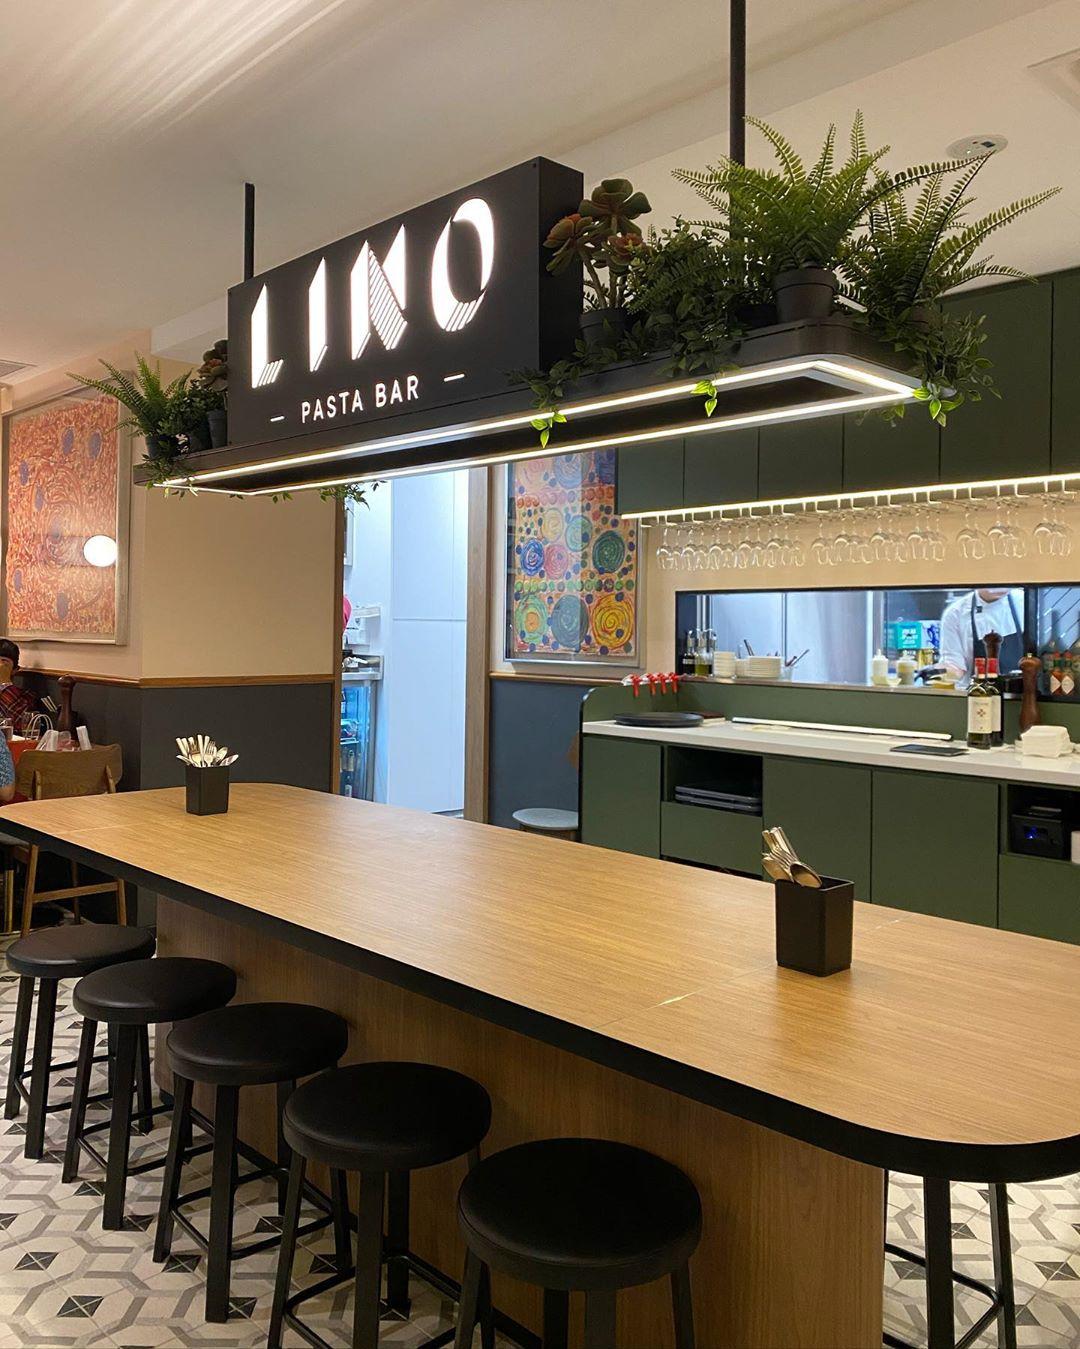 Lino Pasta Bar